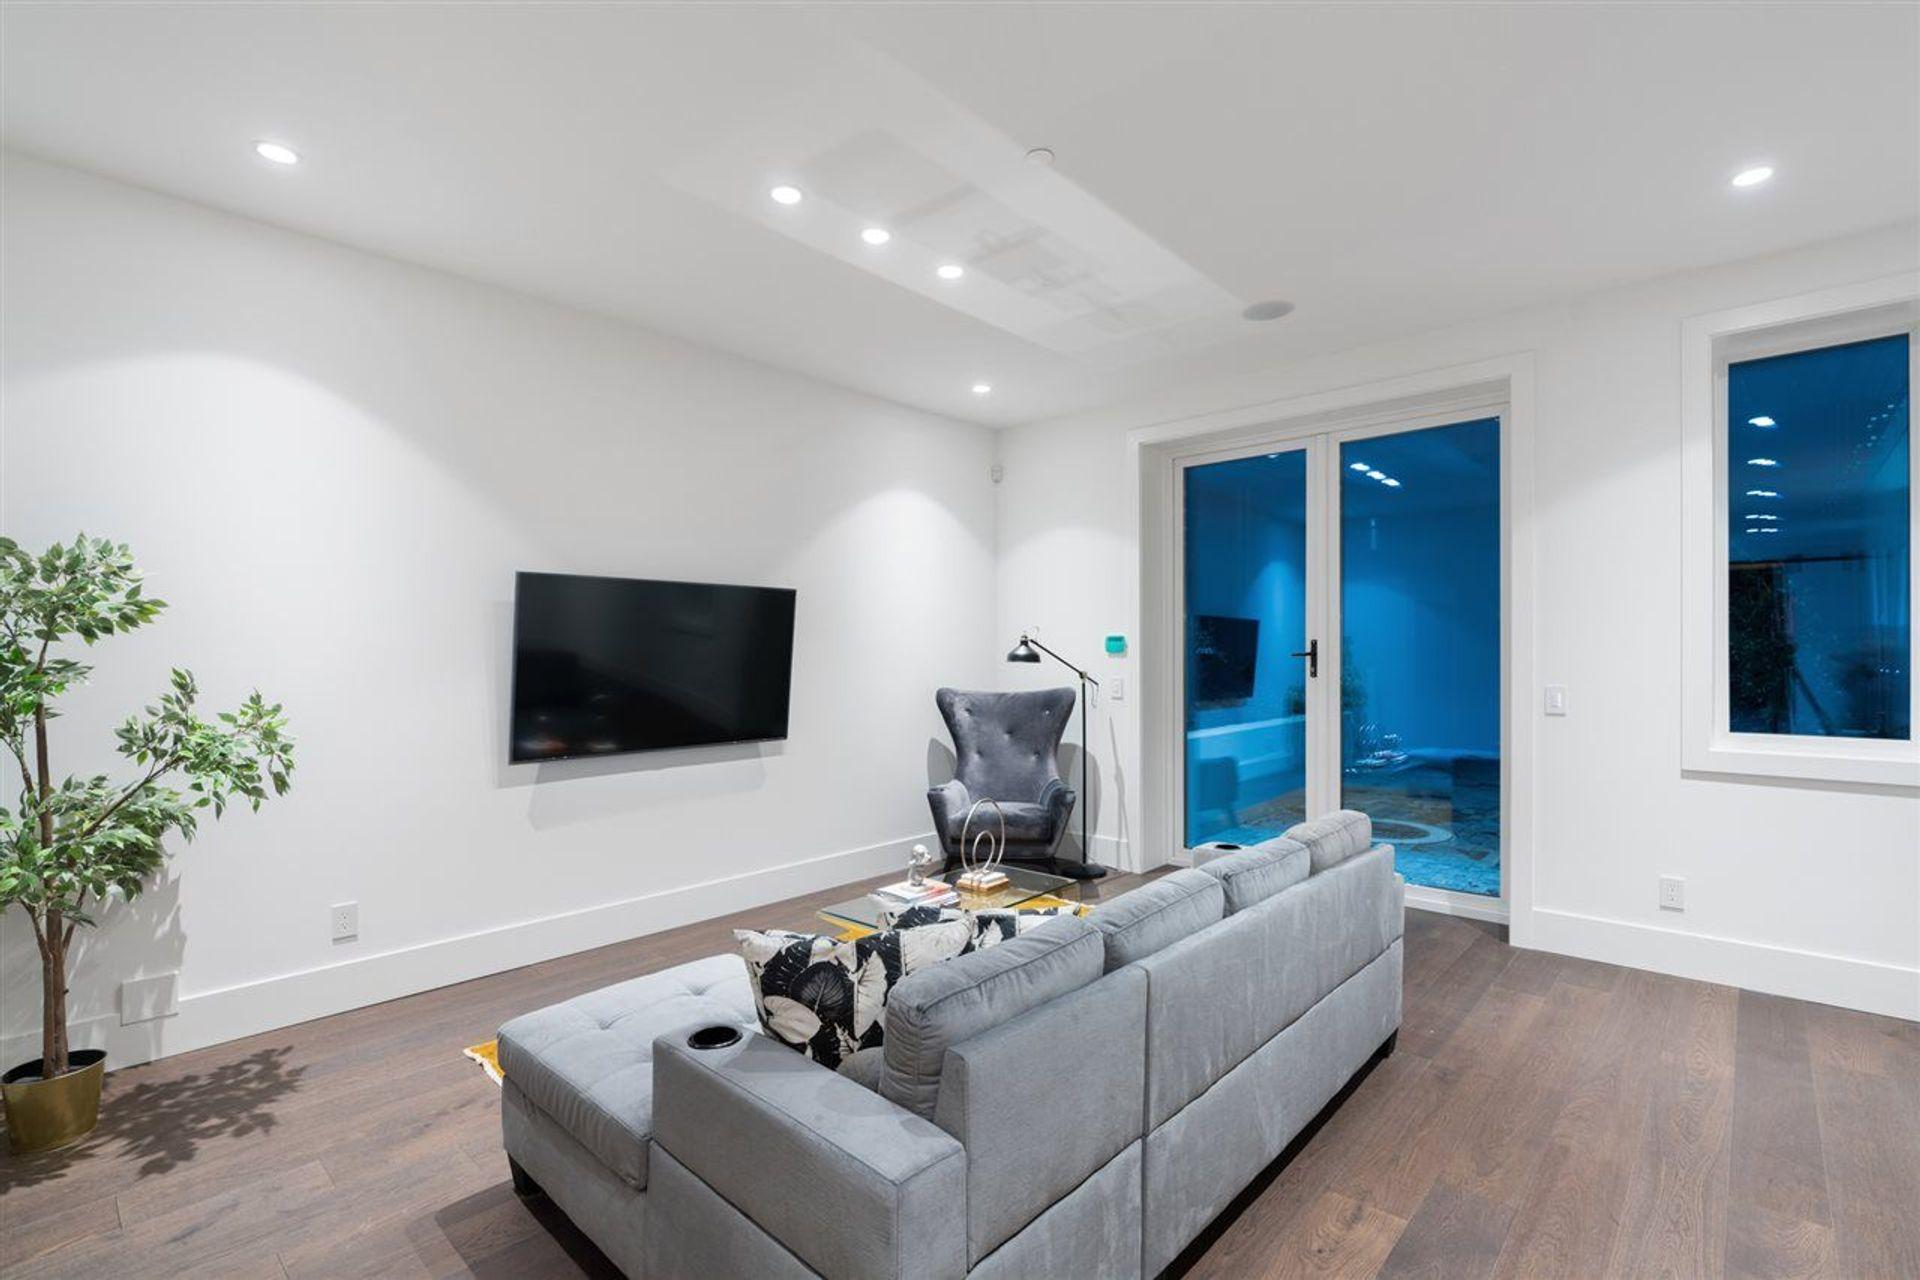 1040-wildwood-lane-british-properties-west-vancouver-24 at 1040 Wildwood Lane, British Properties, West Vancouver